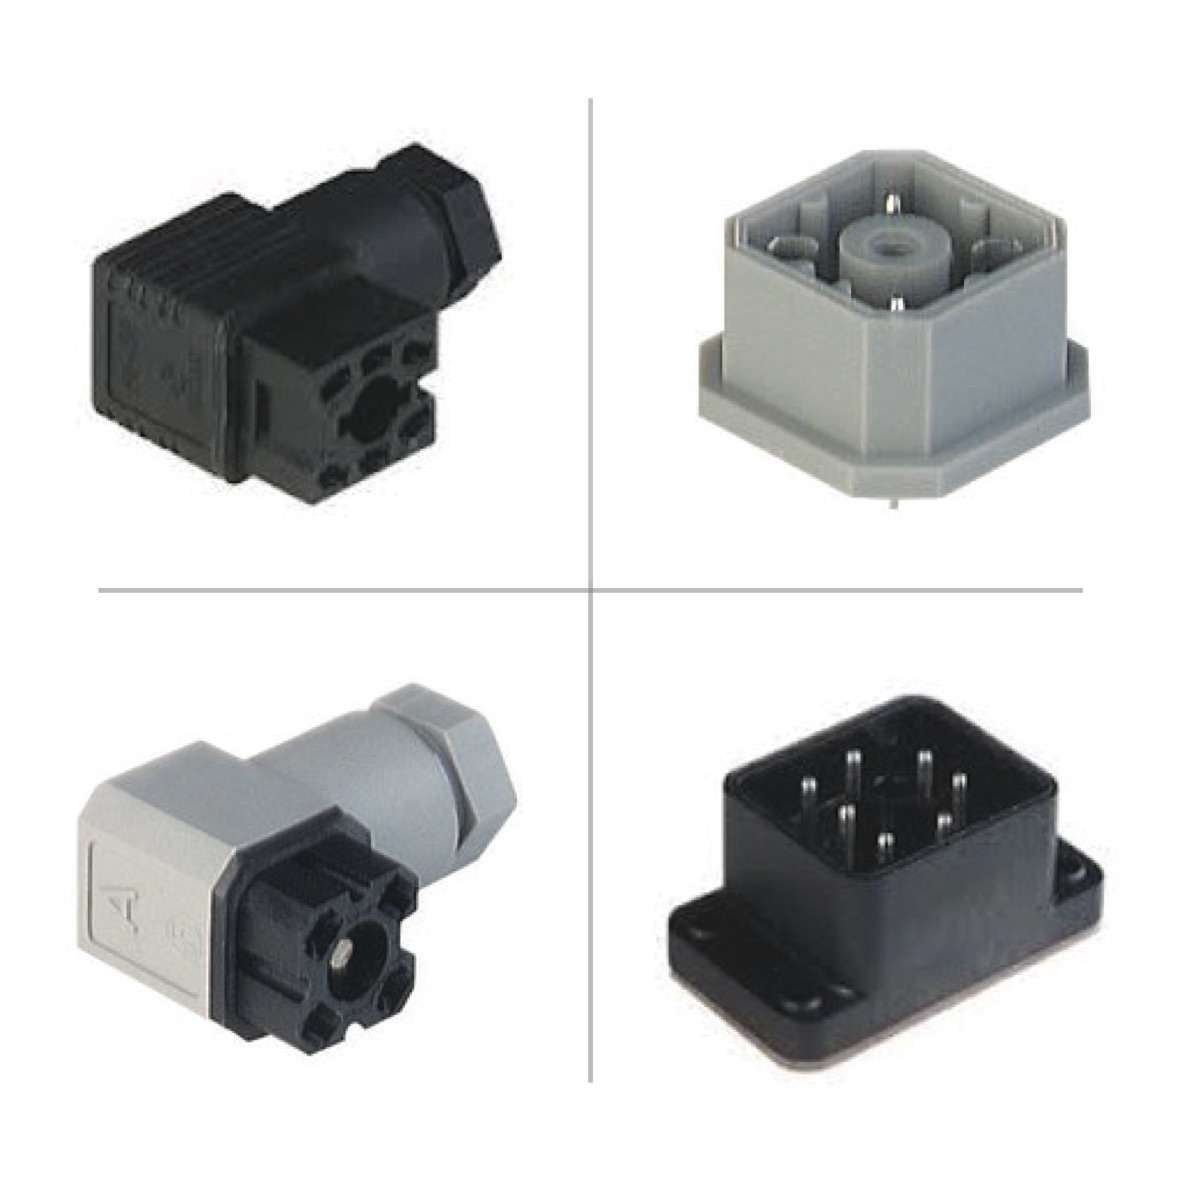 Hirschmann G Series Connectors